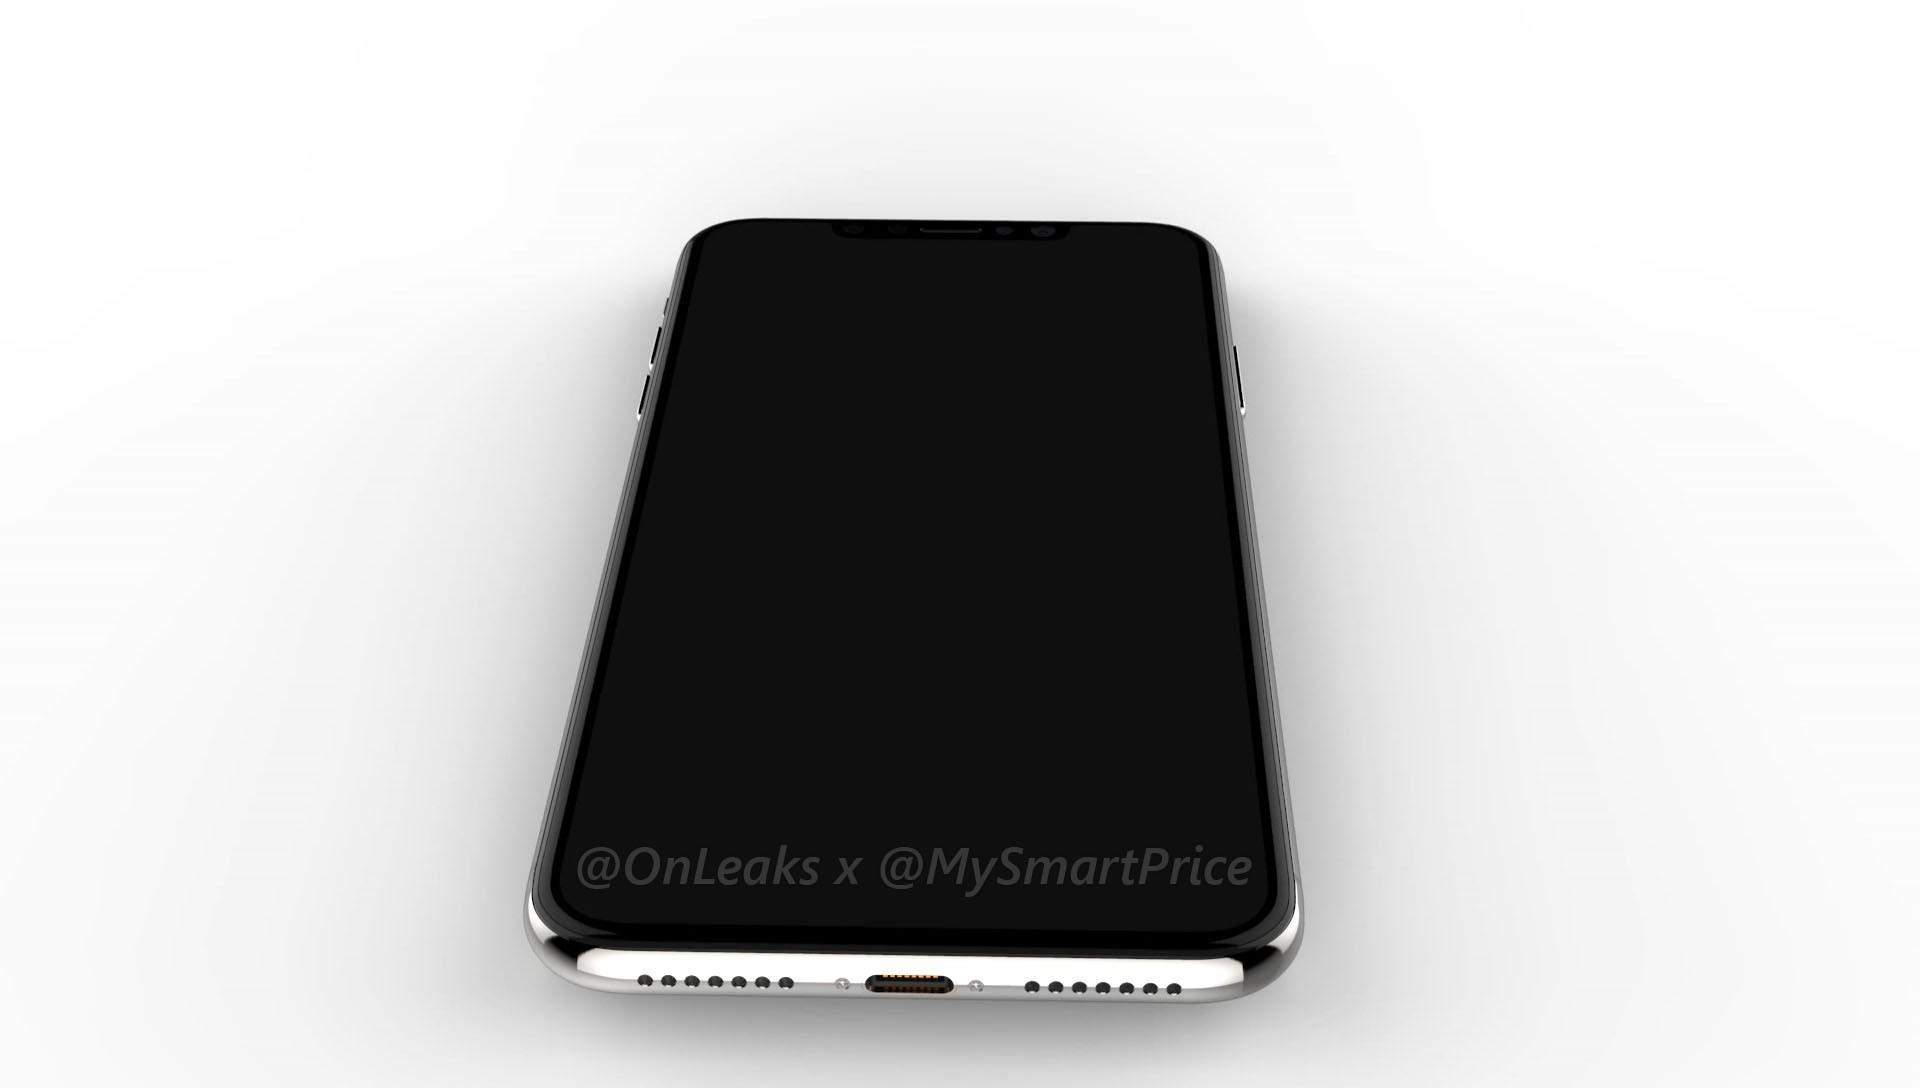 apple s iphone x plus leaked 521376 4 - تصاویر فاش شده از آیفون X پلاس